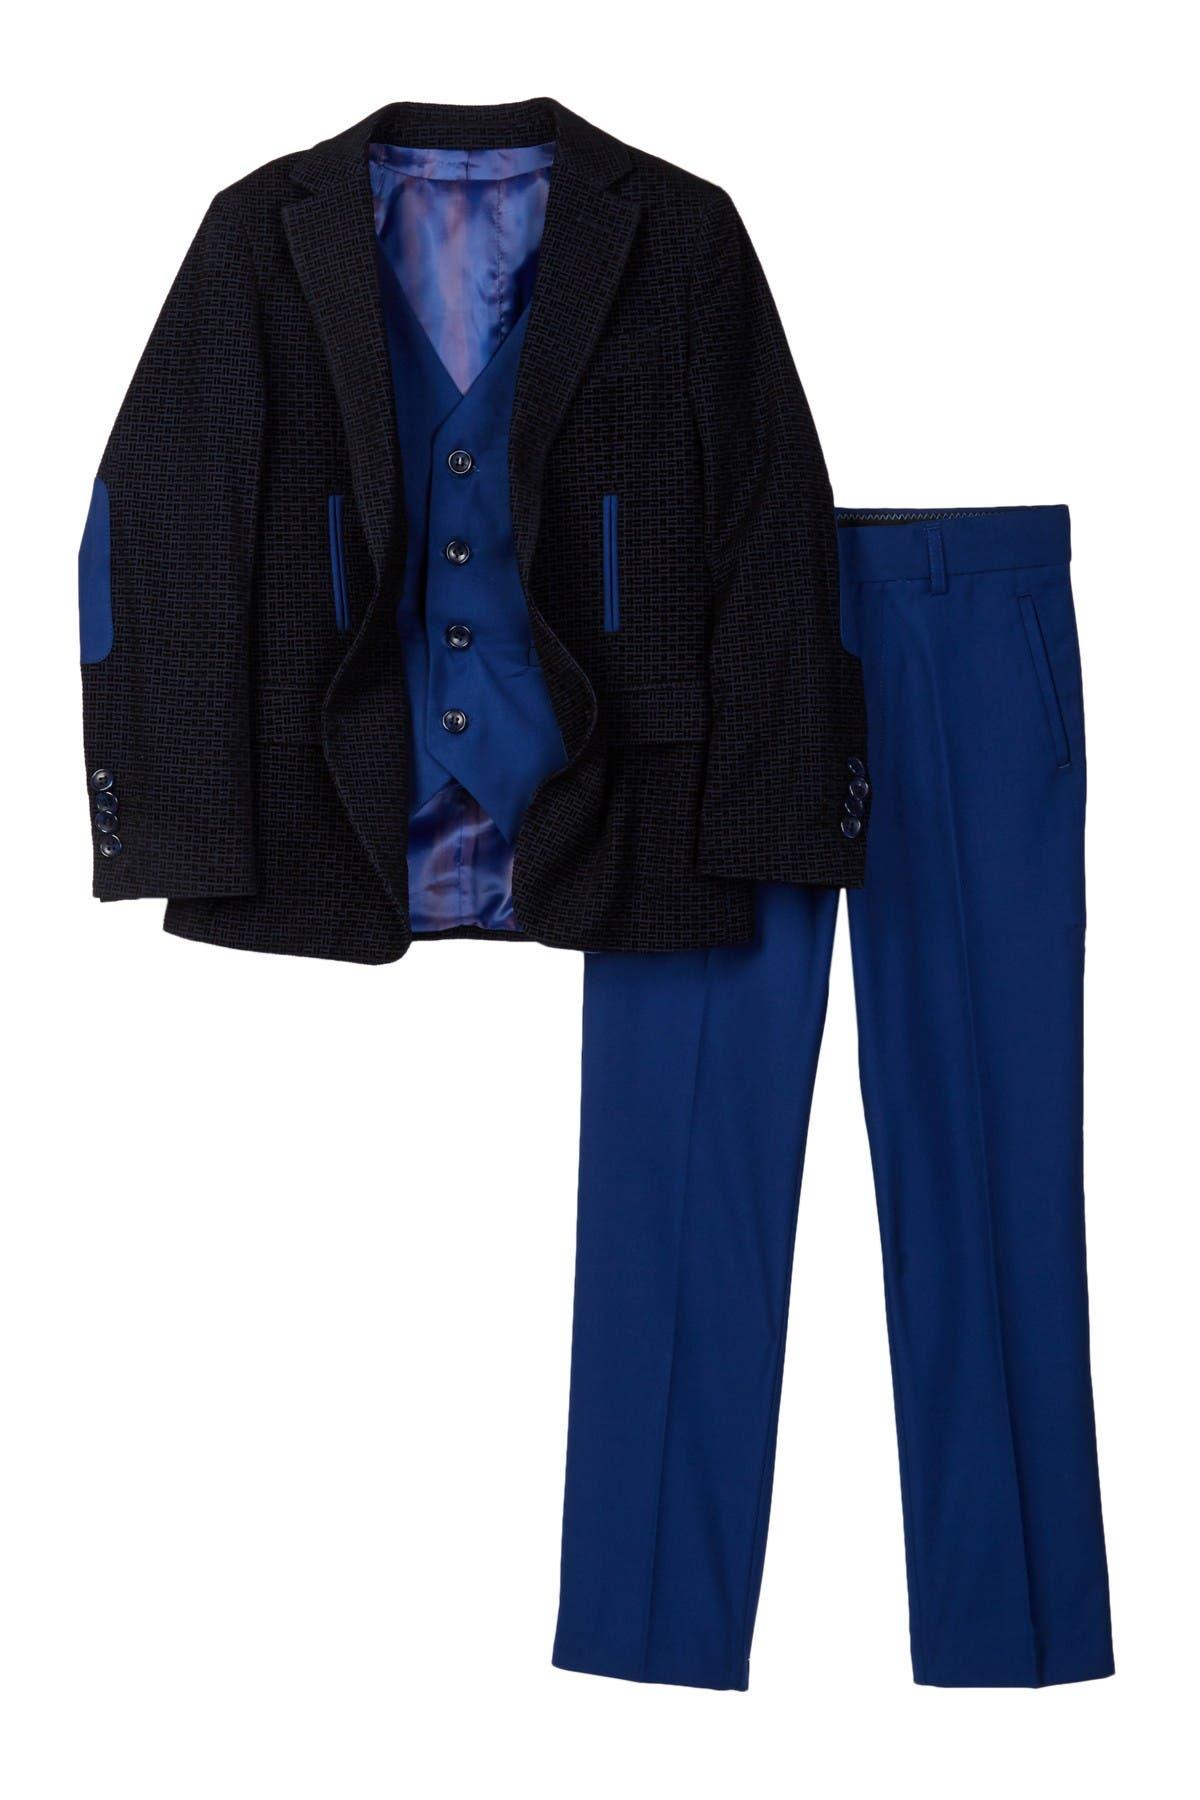 Image of Isaac Mizrahi Tonal Velvet 3-Piece Suit